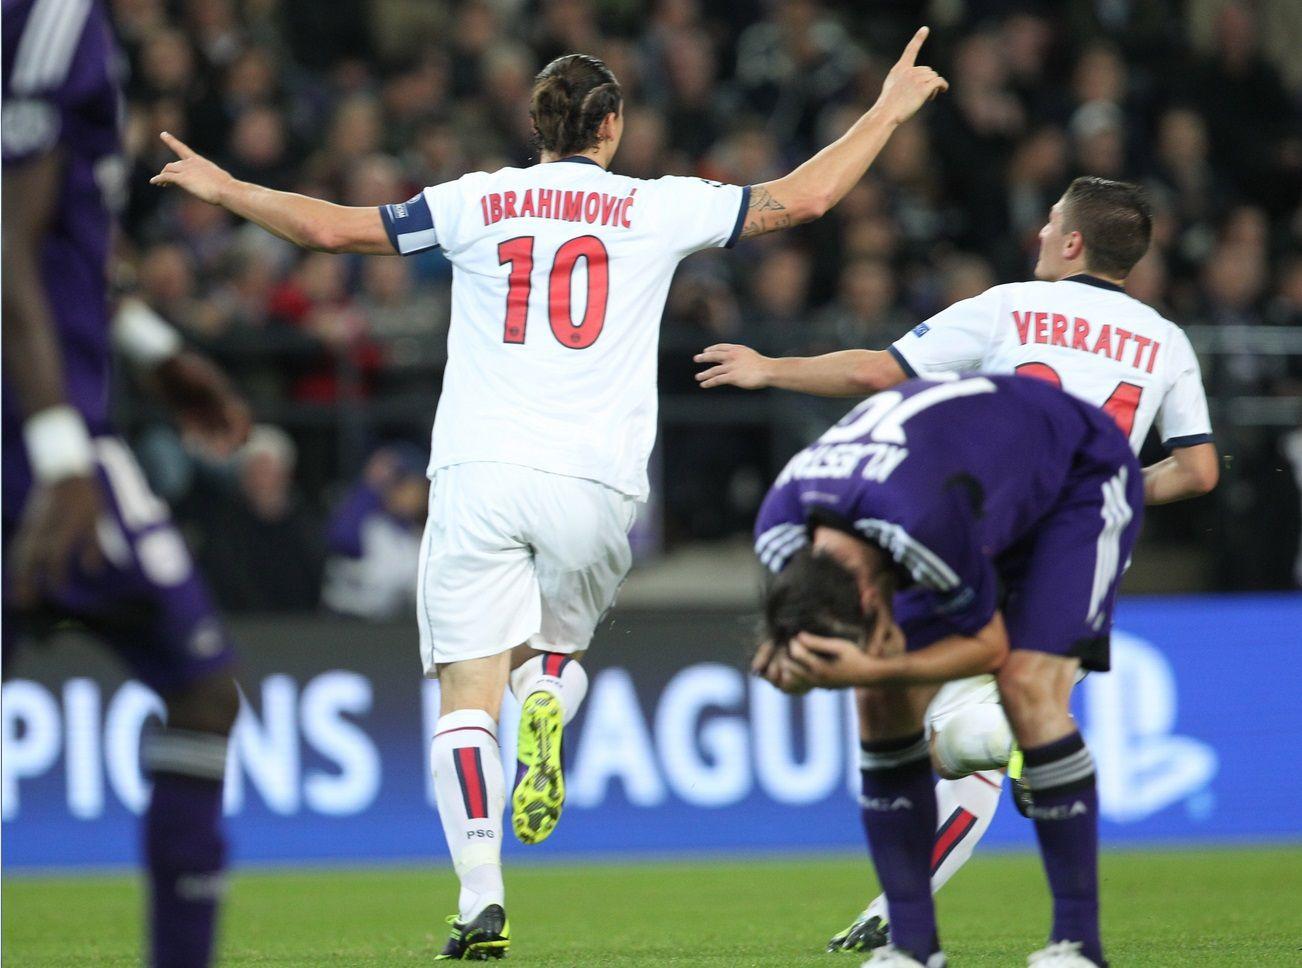 Anderlecht (BEL) 05 PSG (FRA). Champions, Juventus